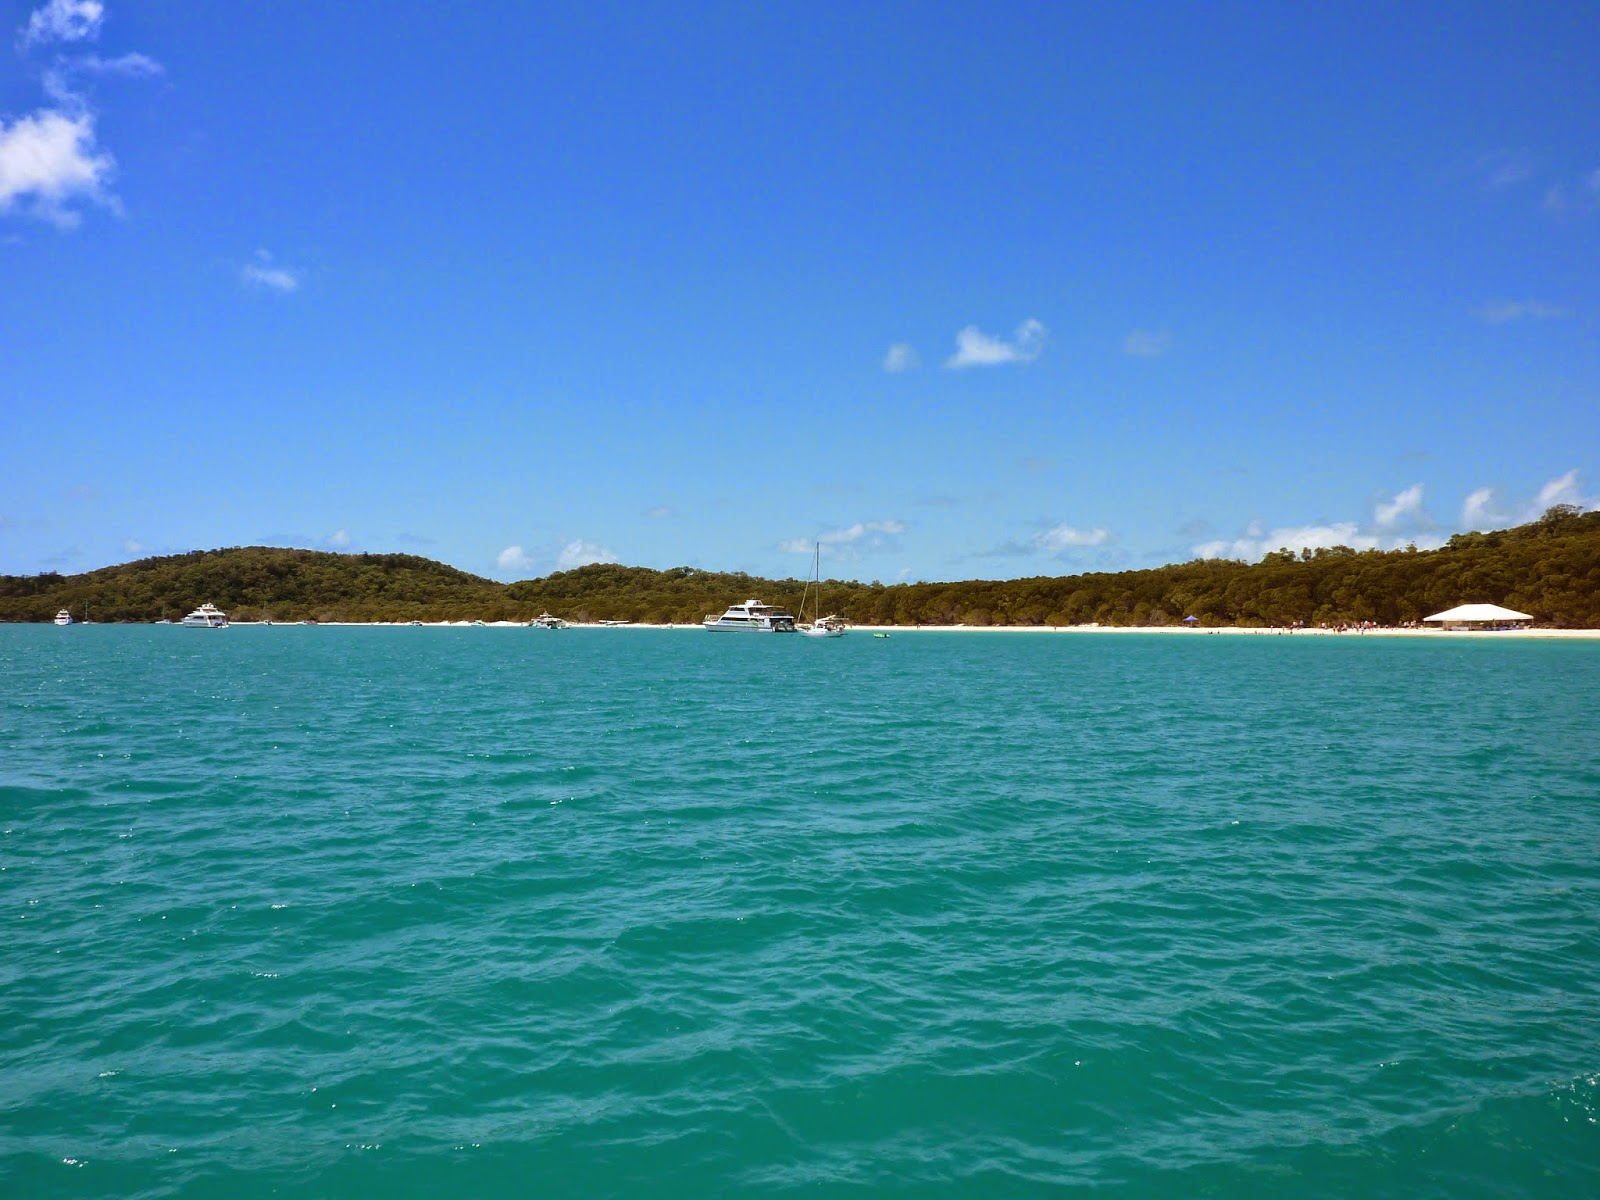 flittern australien dubai whitsunday islands oder 5 sch nster strand der welt. Black Bedroom Furniture Sets. Home Design Ideas